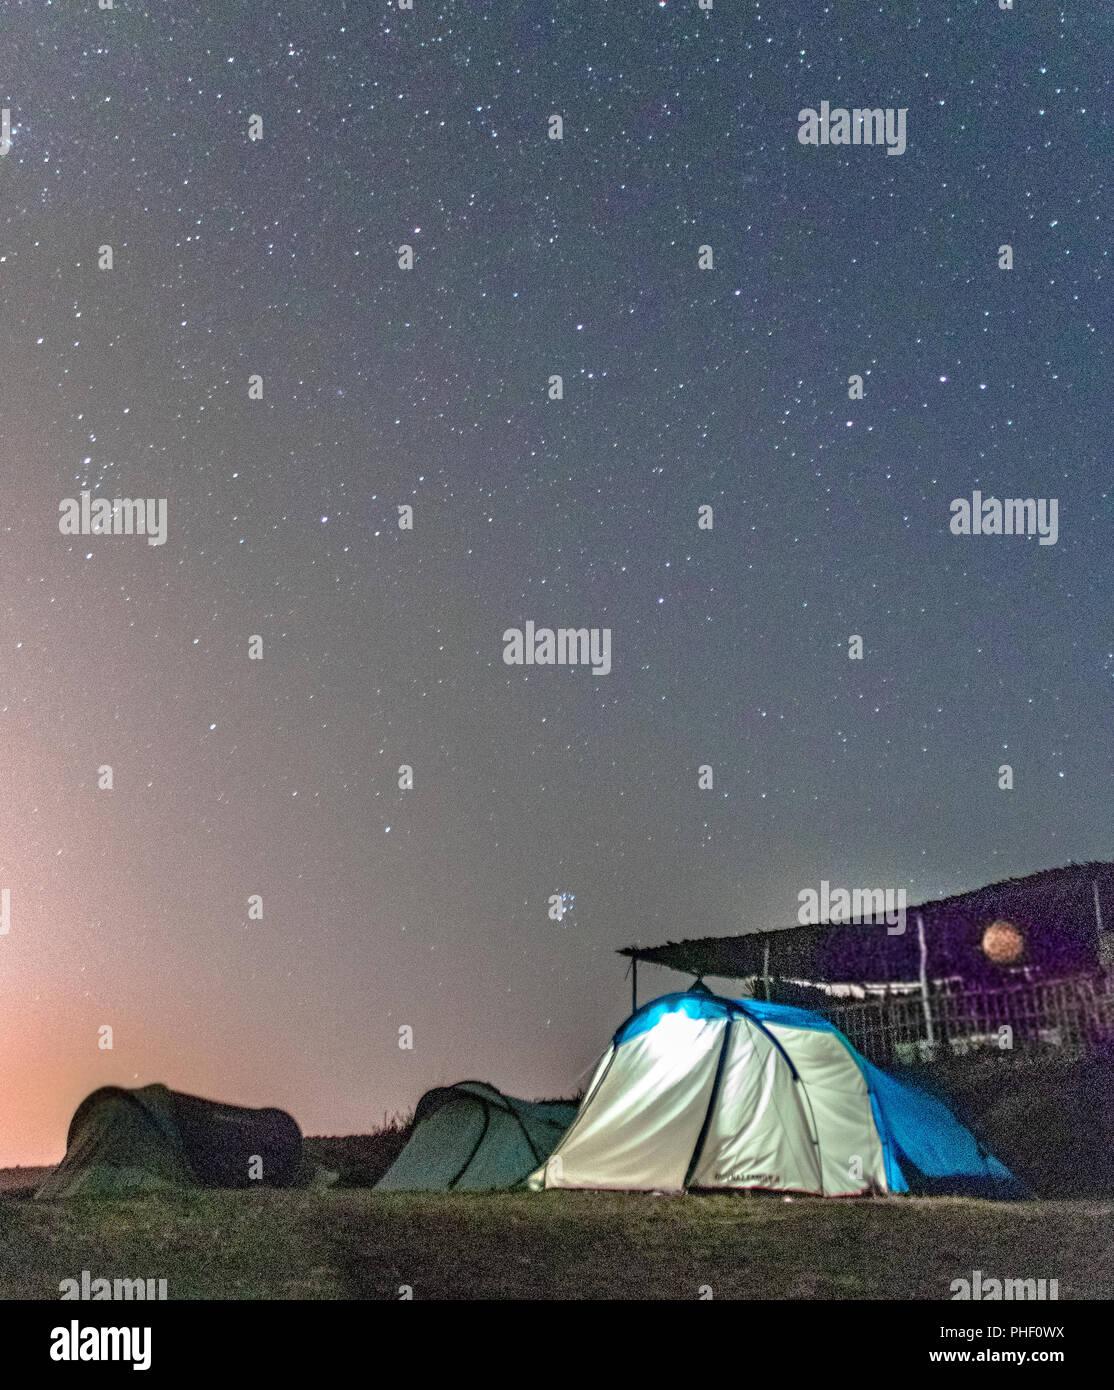 camp Mrissat Astrophotography - Stock Image